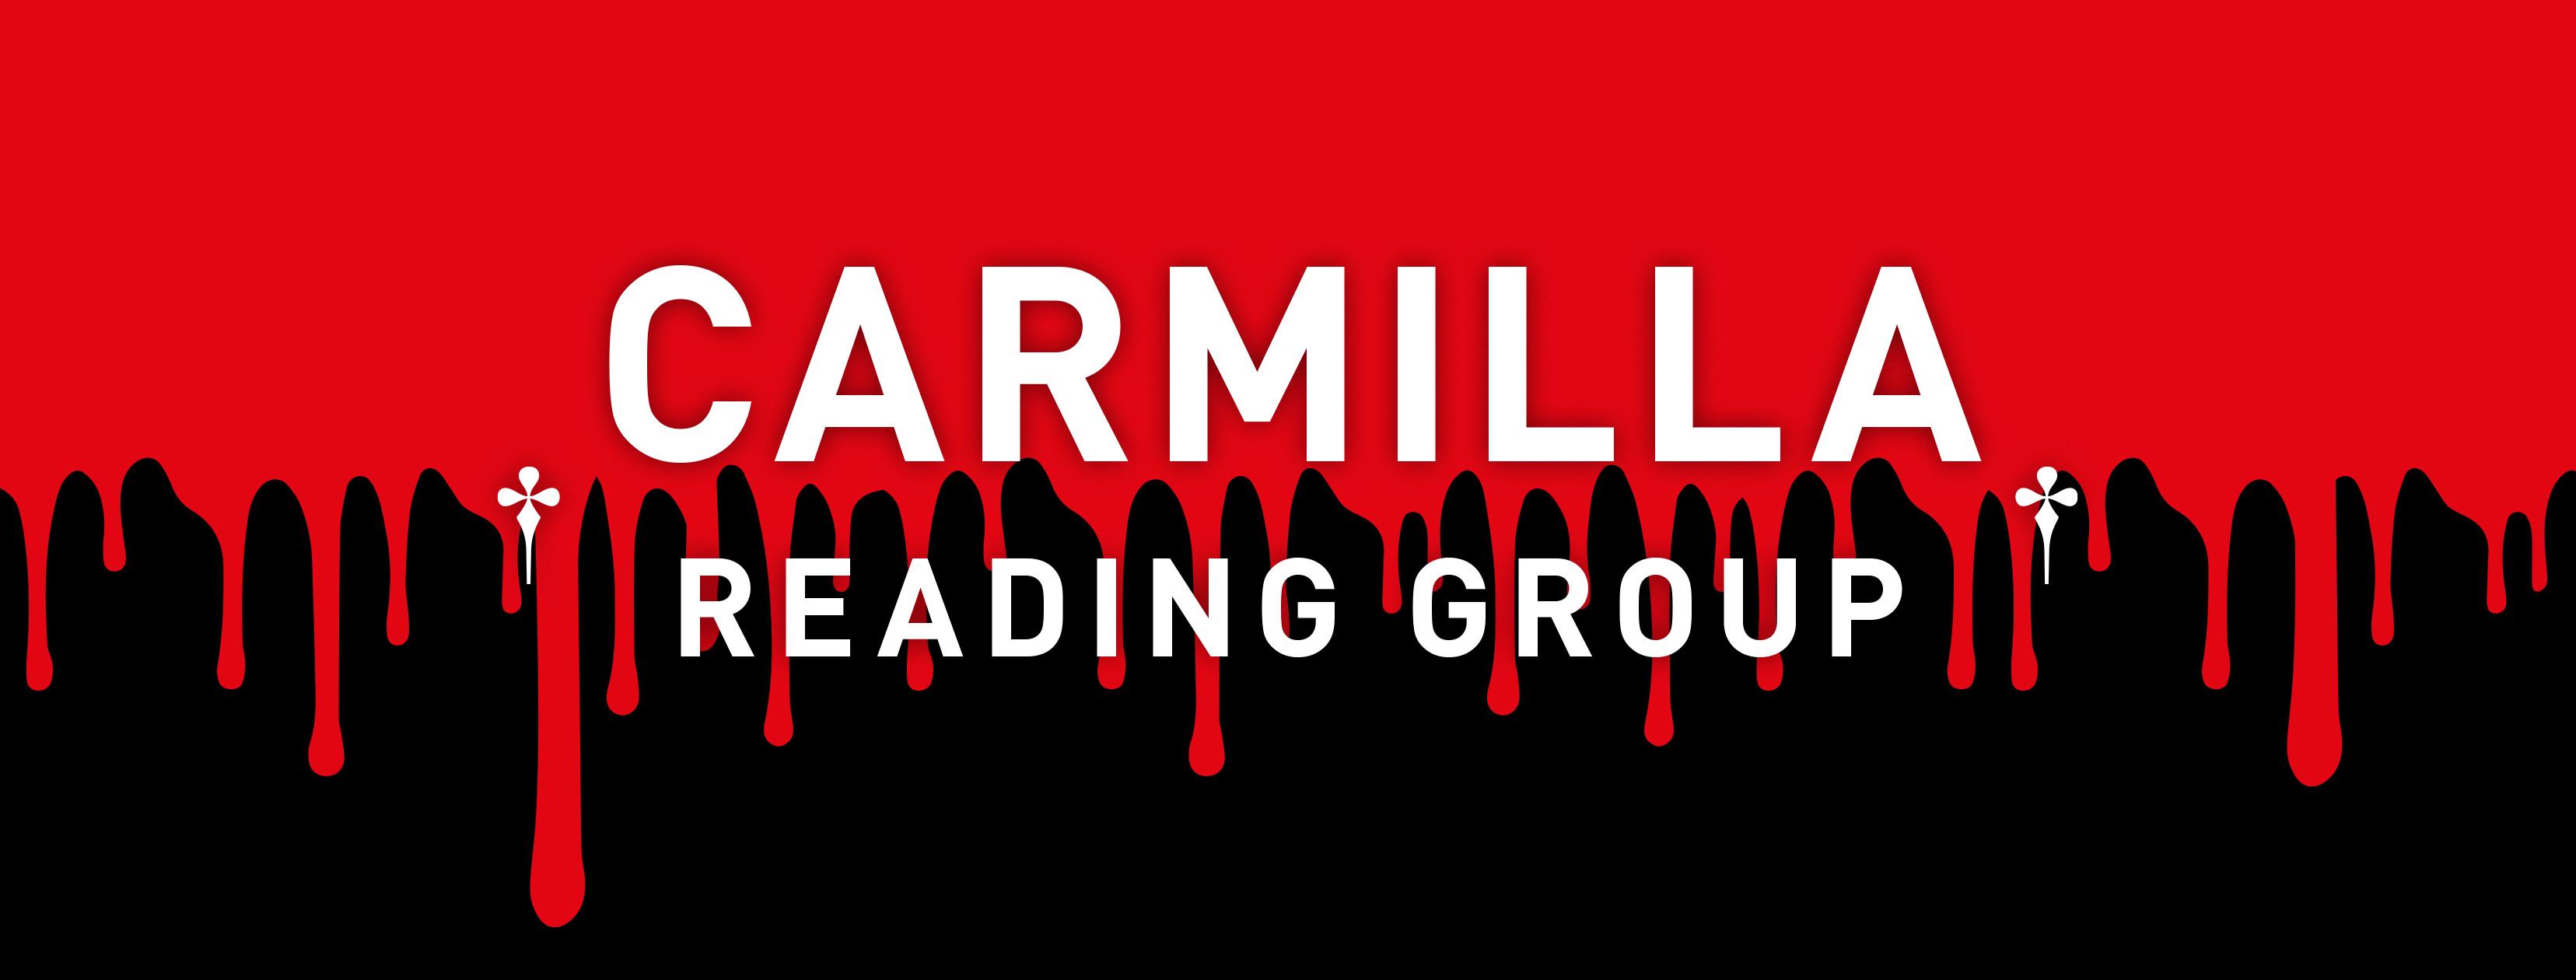 Carmilla // Reading Group, graphic design: (c) Andrea Lehsiak, 2020